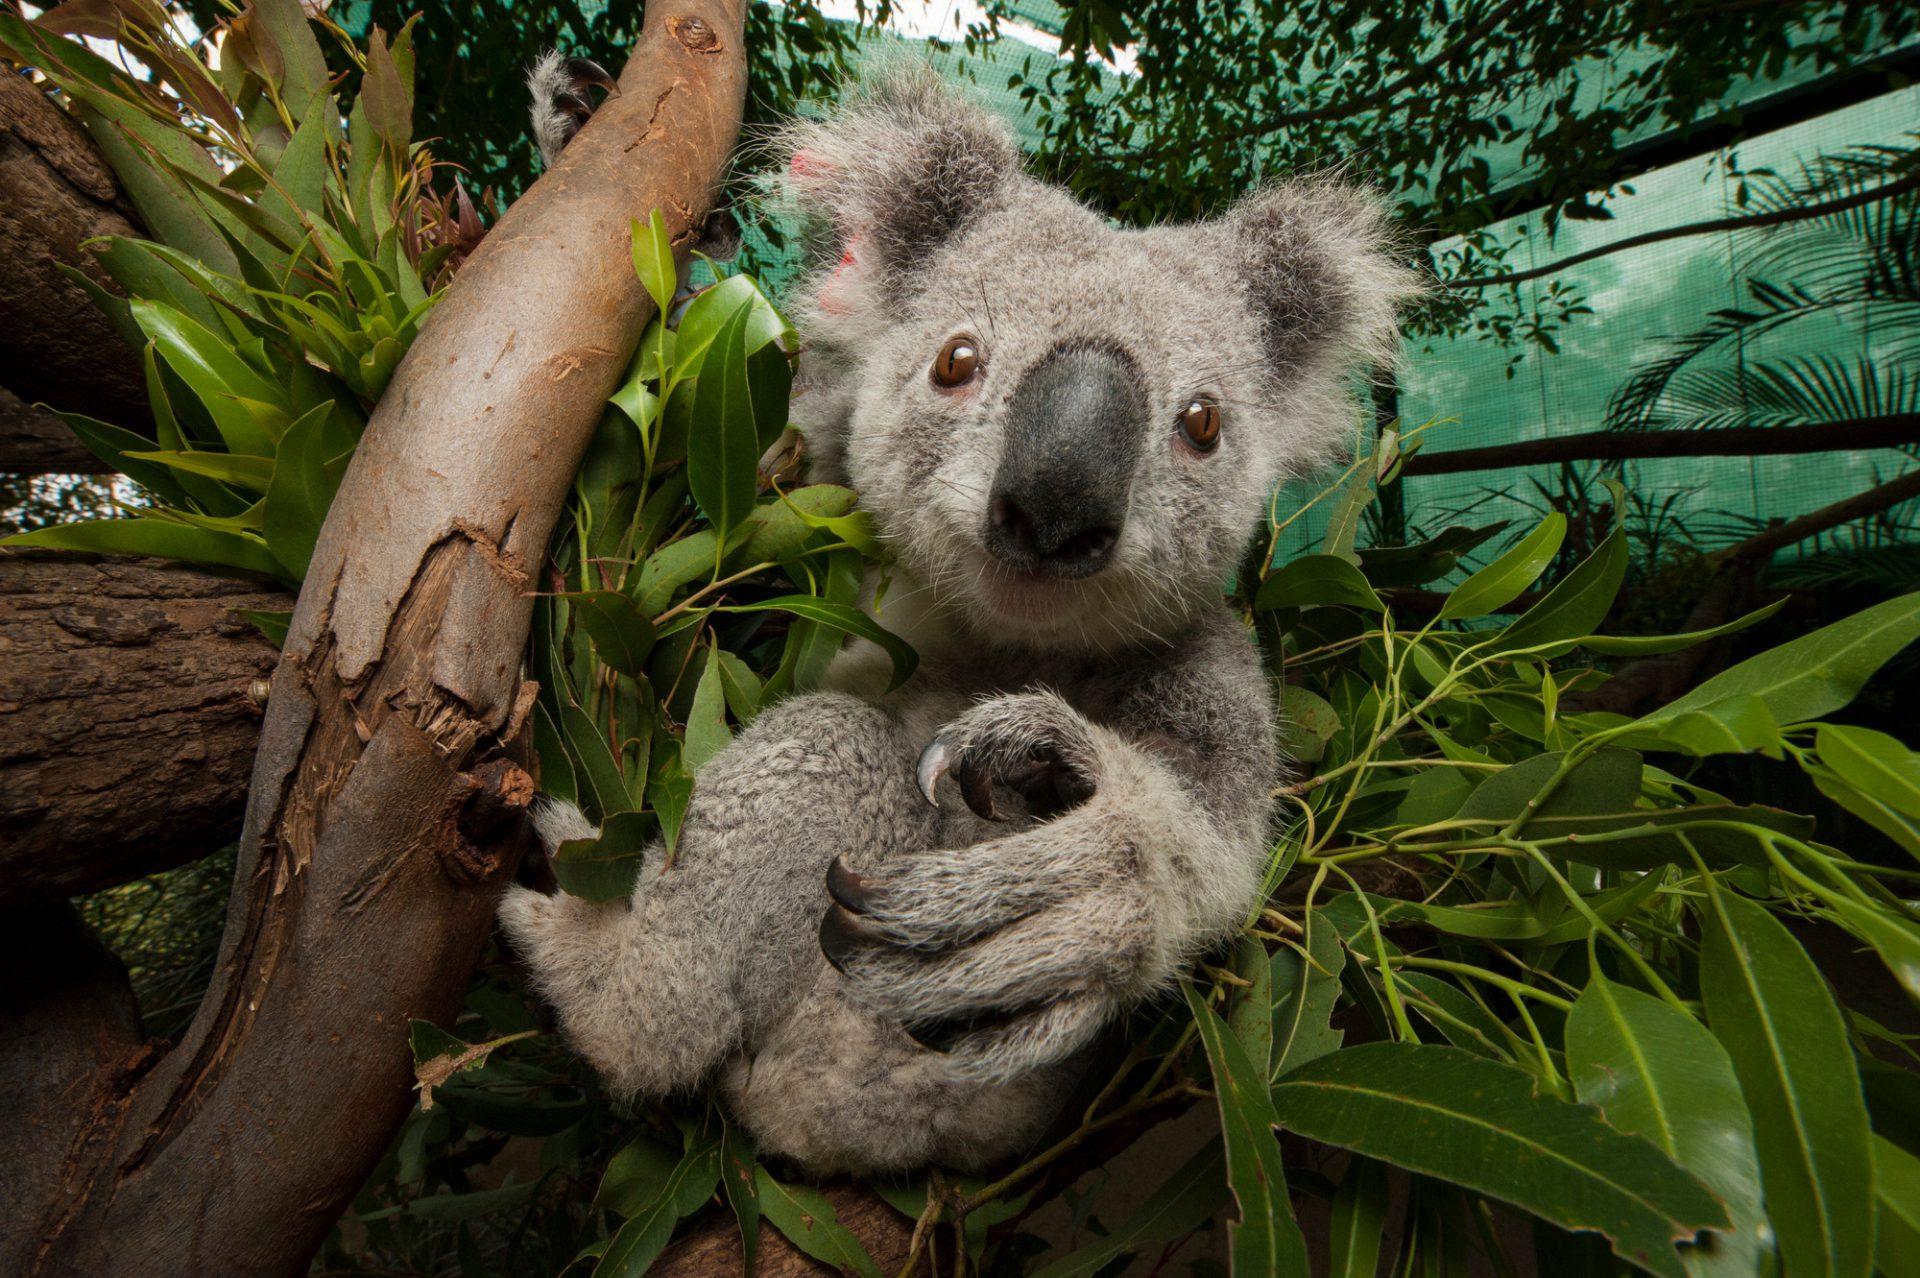 рюриковичи коала на бамбуке картинки хотела, чтобы